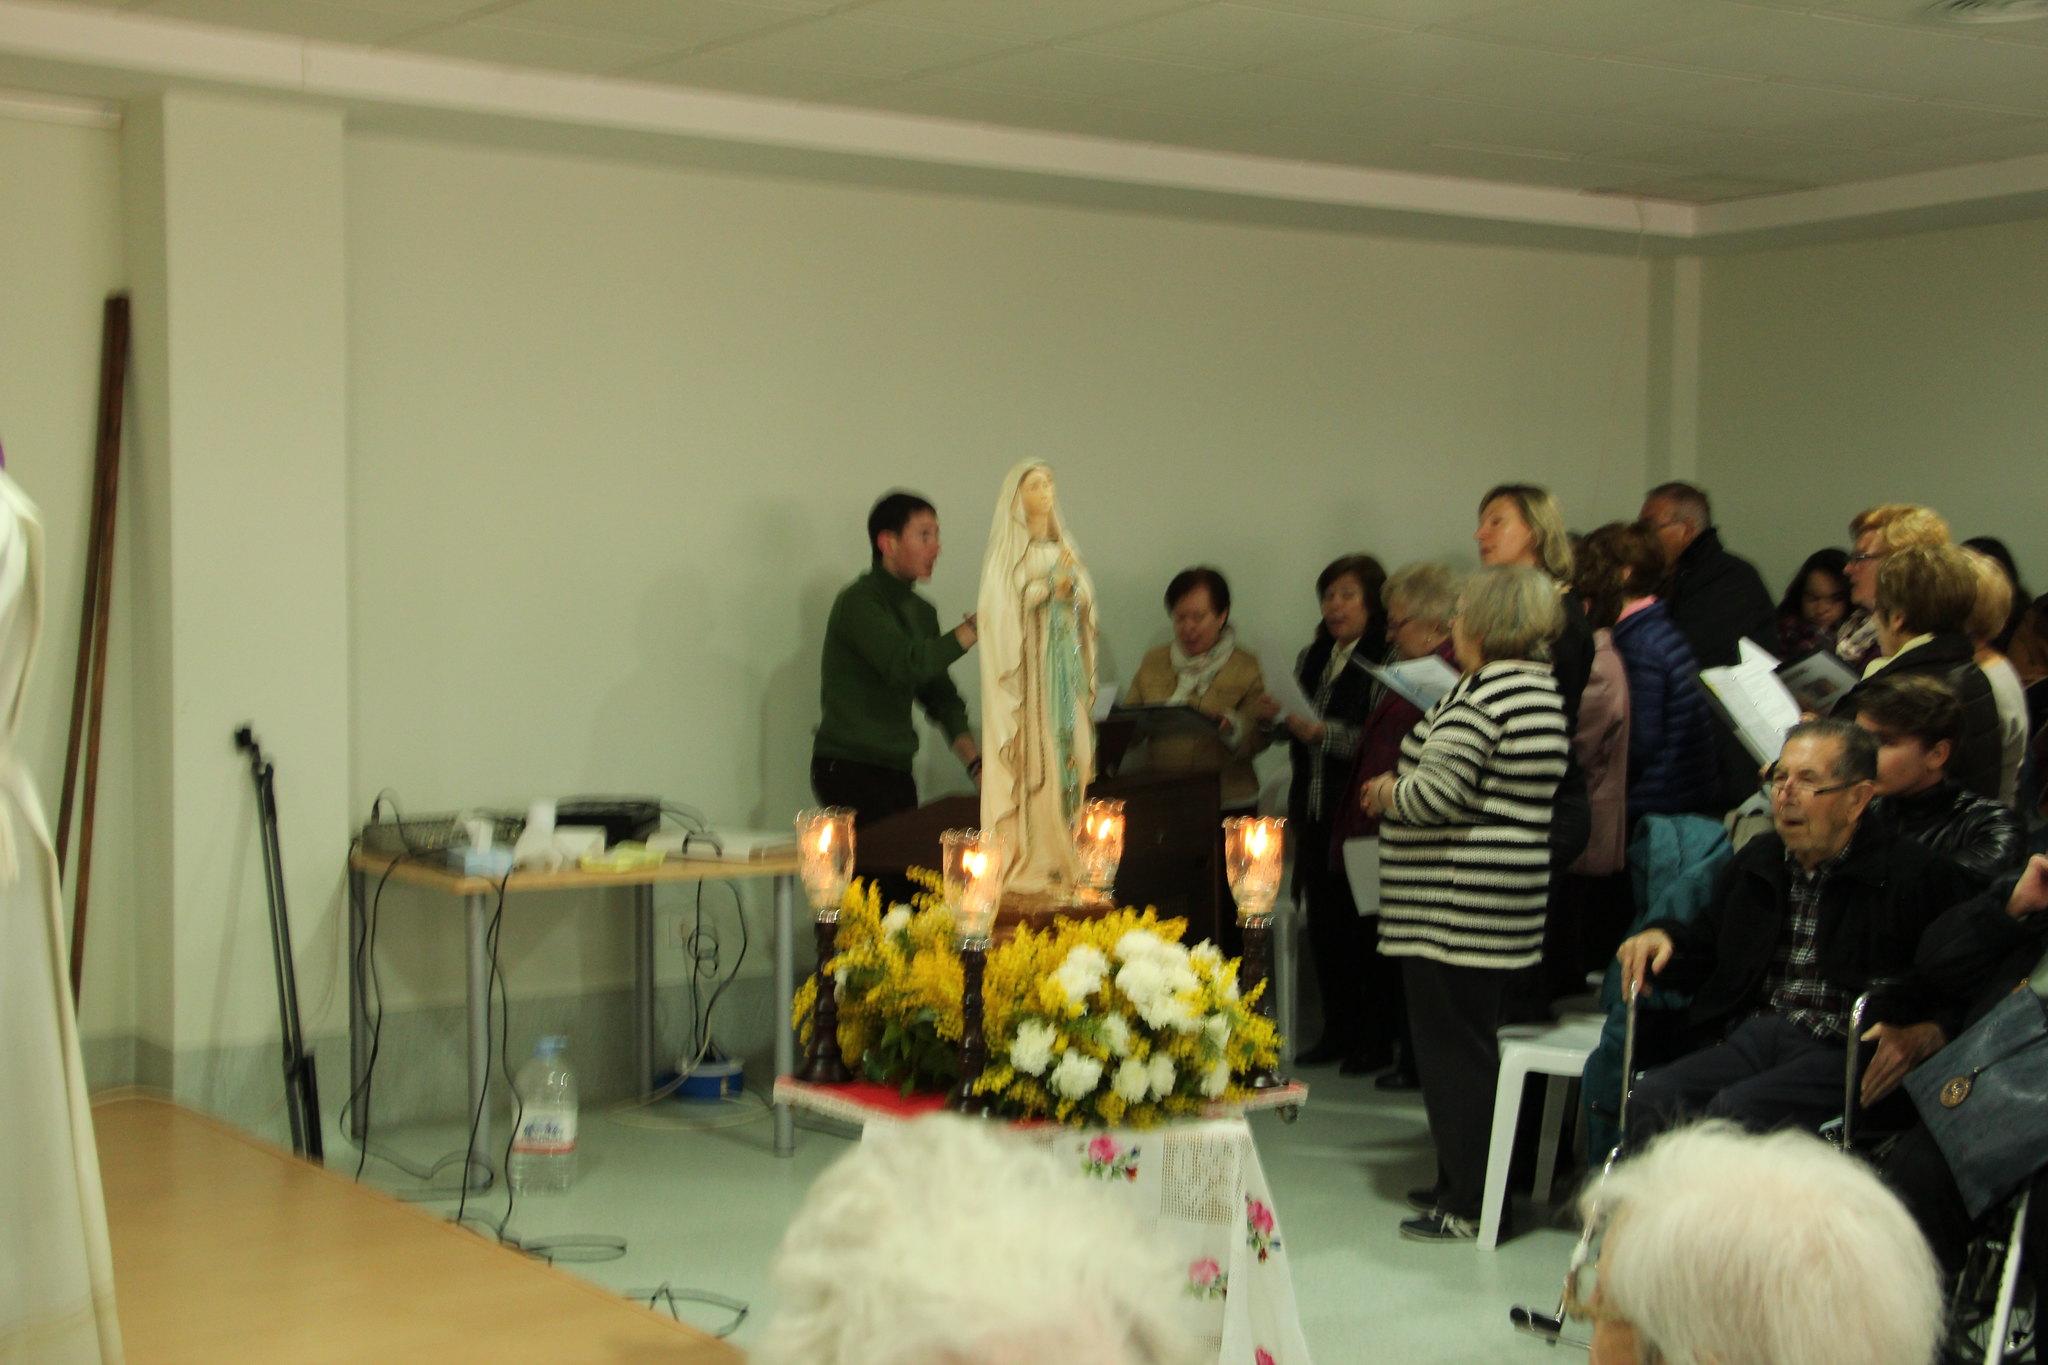 (2016-02-13) - Inauguración Virgen De Lourdes, La Molineta - Archivo La Molineta (002)